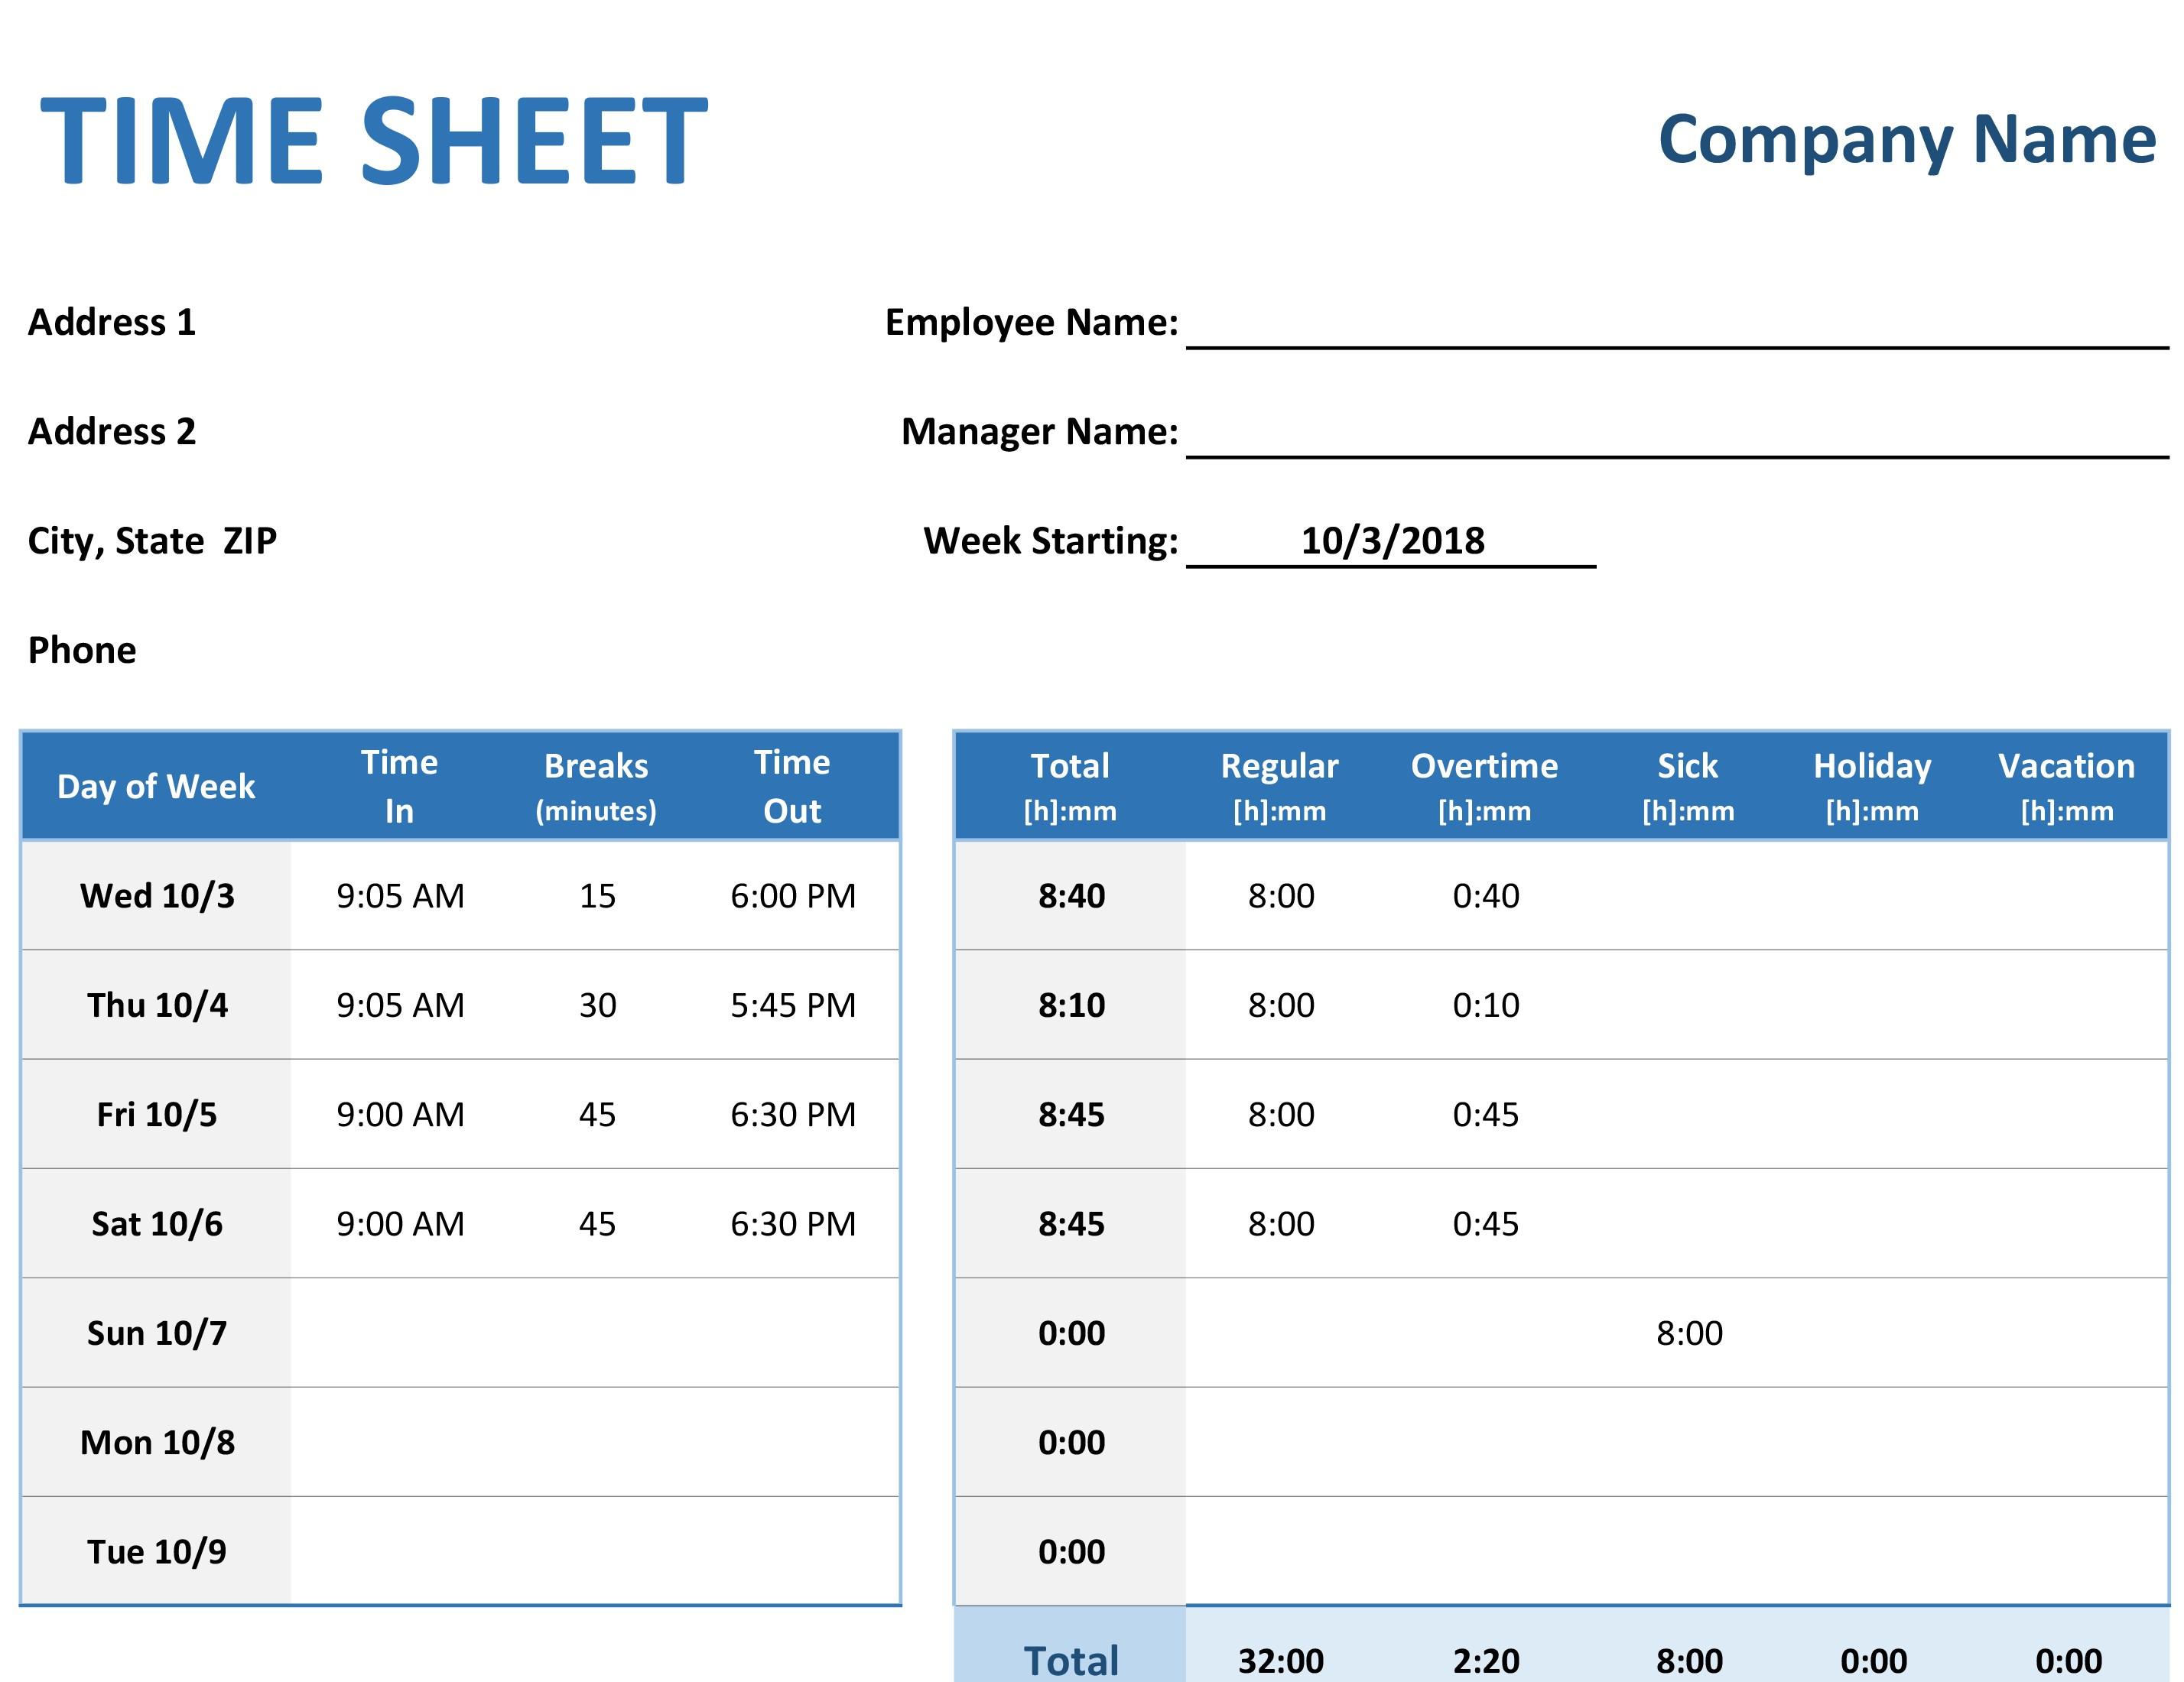 Documents Of Self Calculating Timesheet Excel Template For Self Calculating Timesheet Excel Template In Workshhet